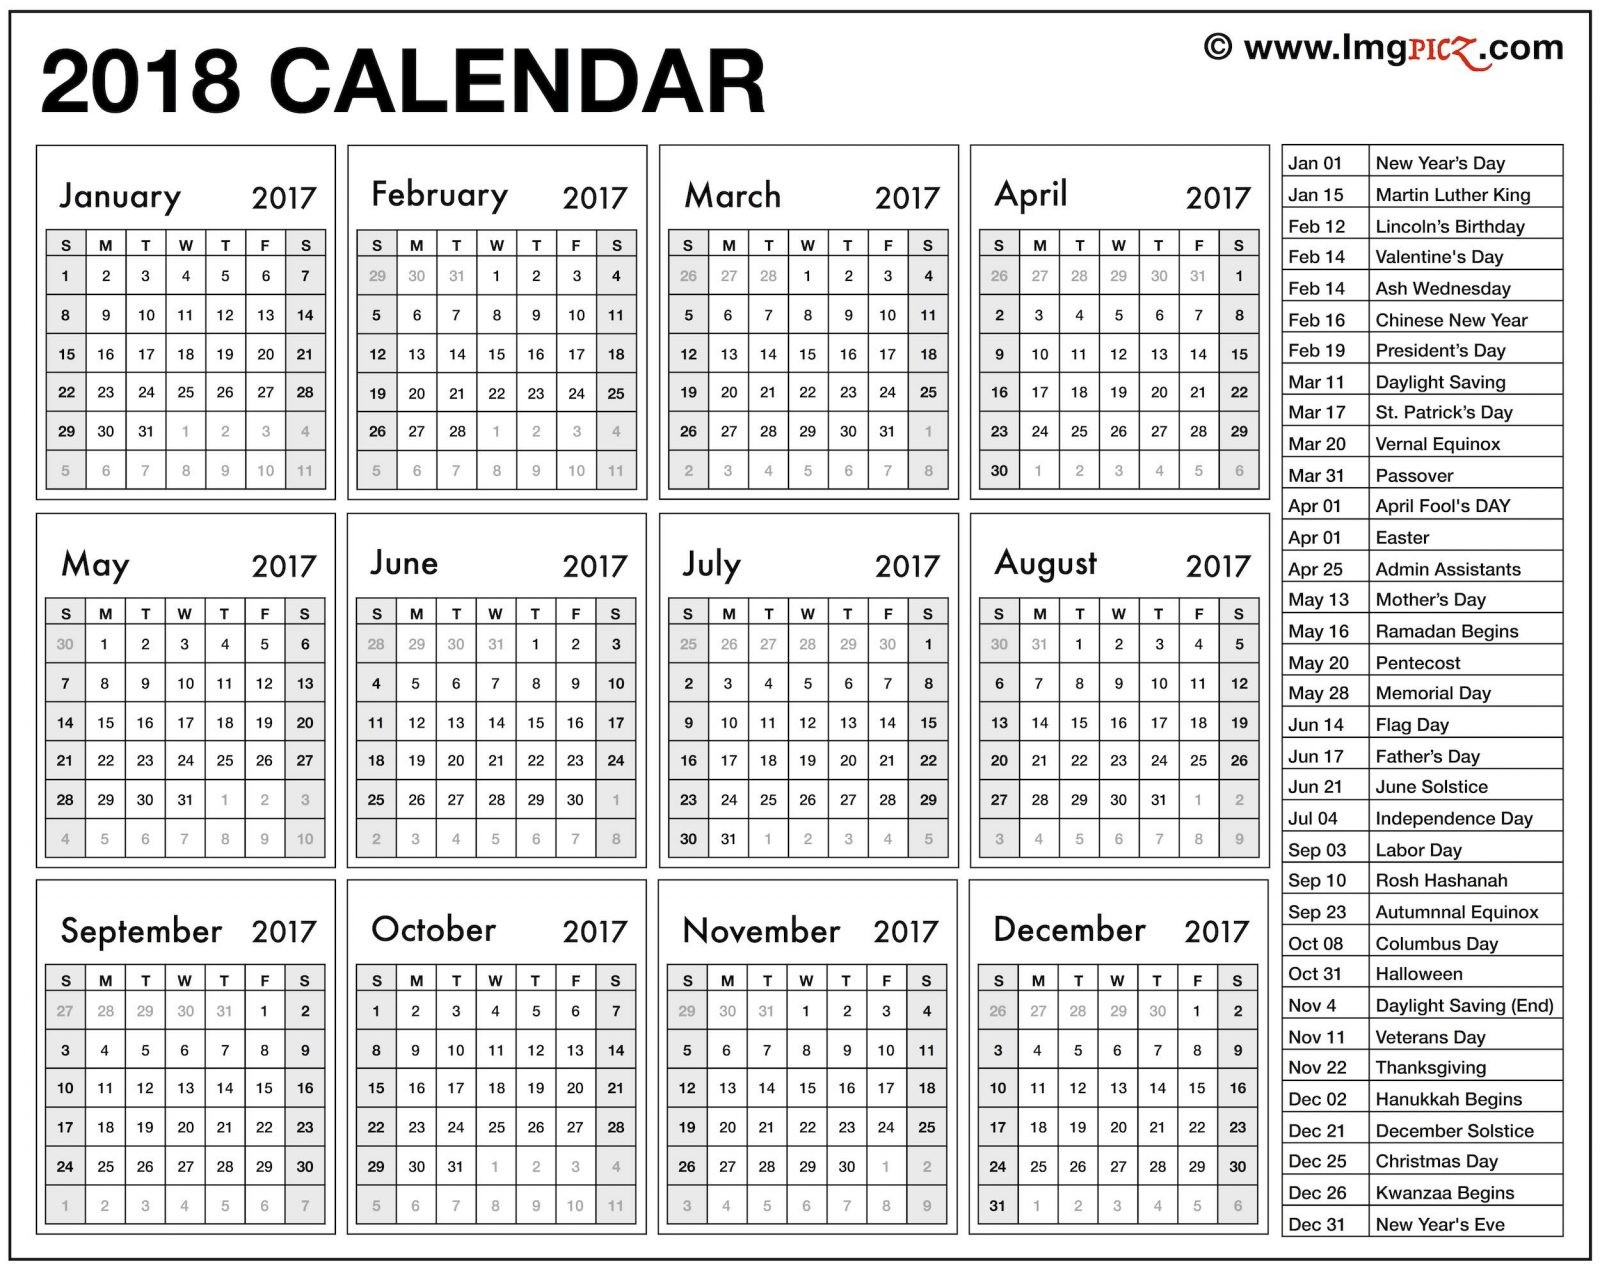 Blank Calendar 2019 Excel Más Populares 2018 Printable Calendar Template Excel Pdf Ms Word Doc Holidays Fair Of Blank Calendar 2019 Excel Más Reciente Free Printable 2019 Calendar